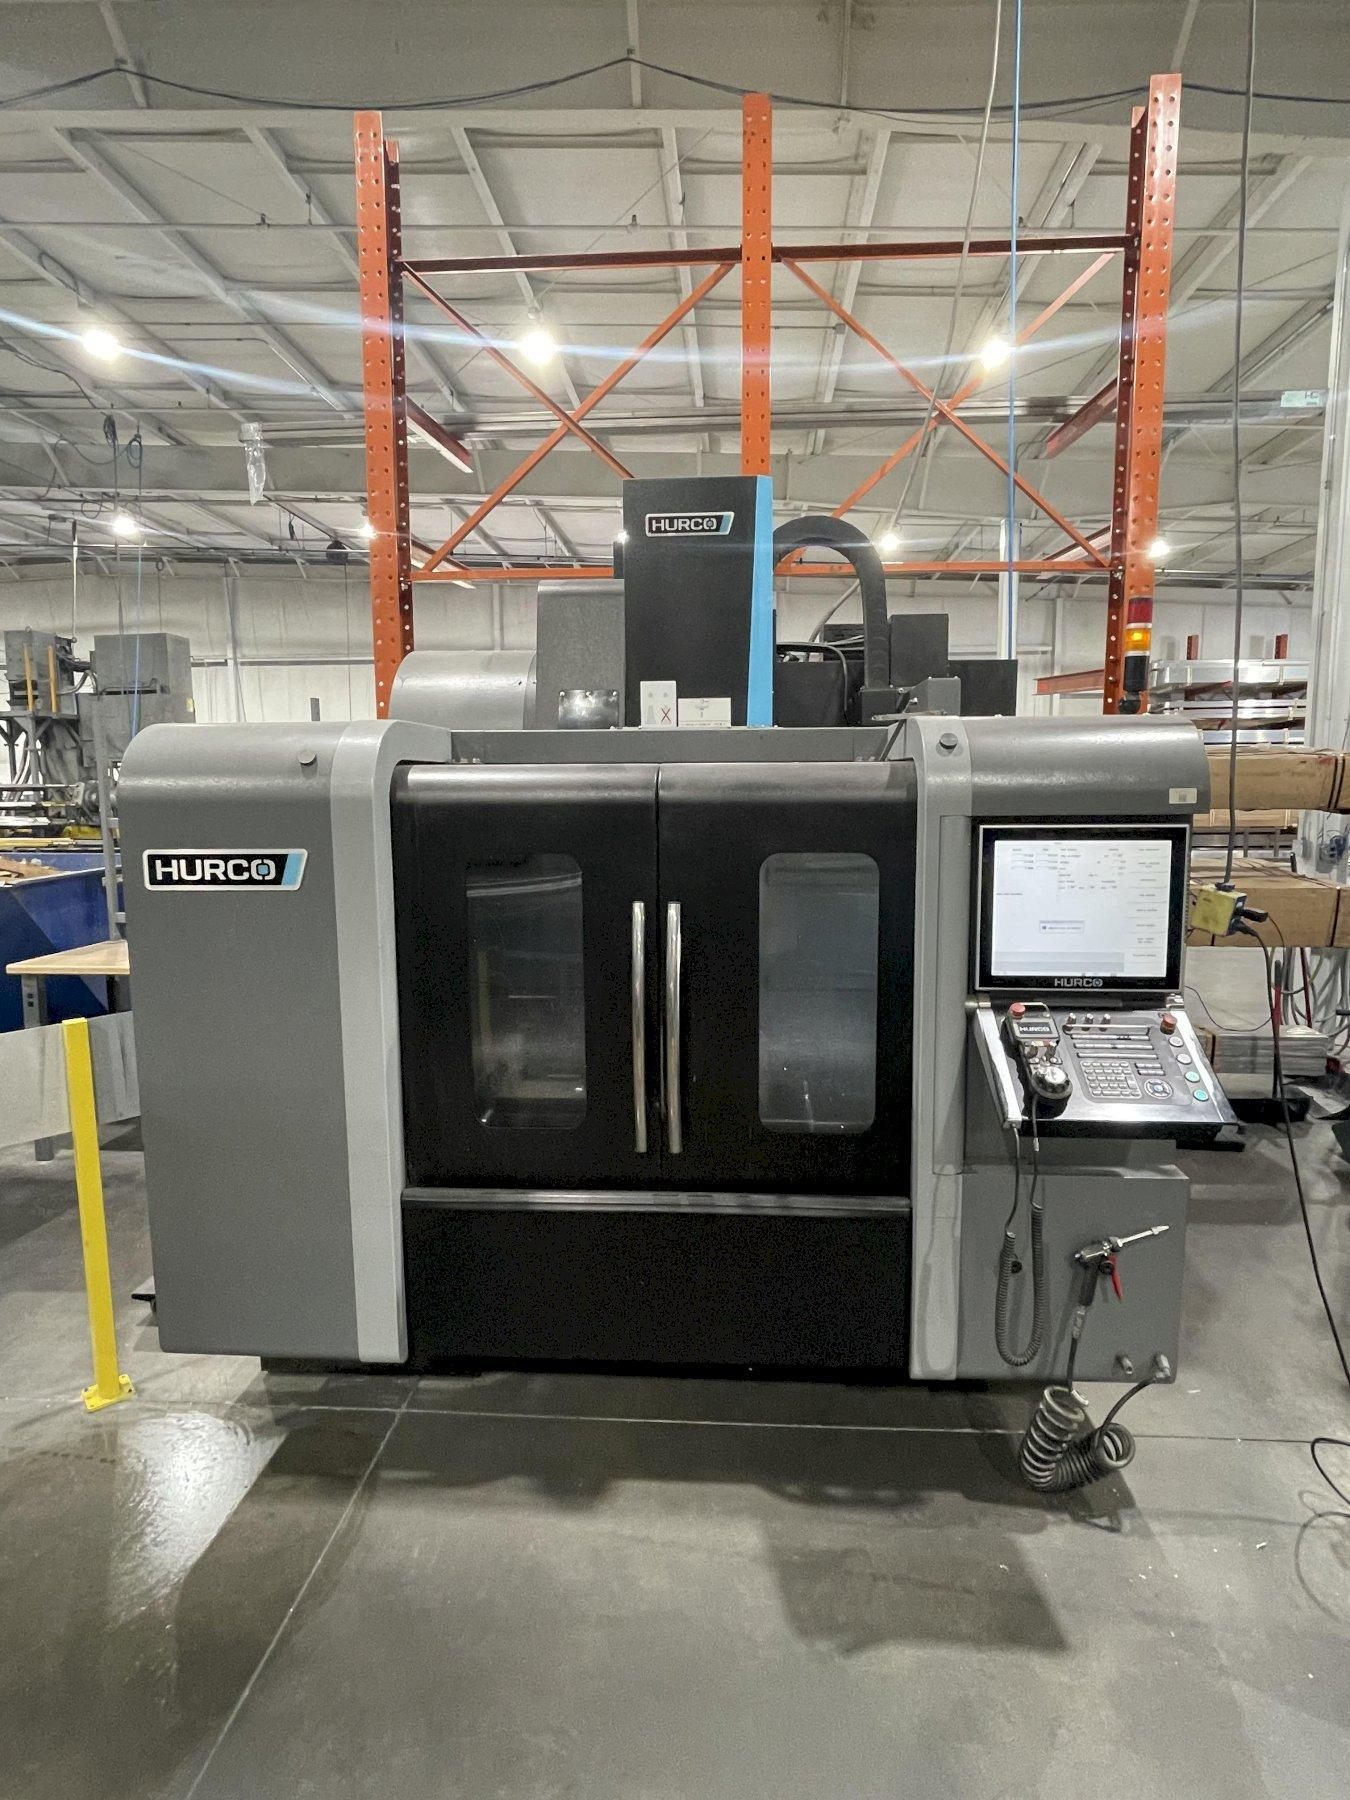 2016 HURCO VM20i CNC VERTICAL MACHINING CENTER